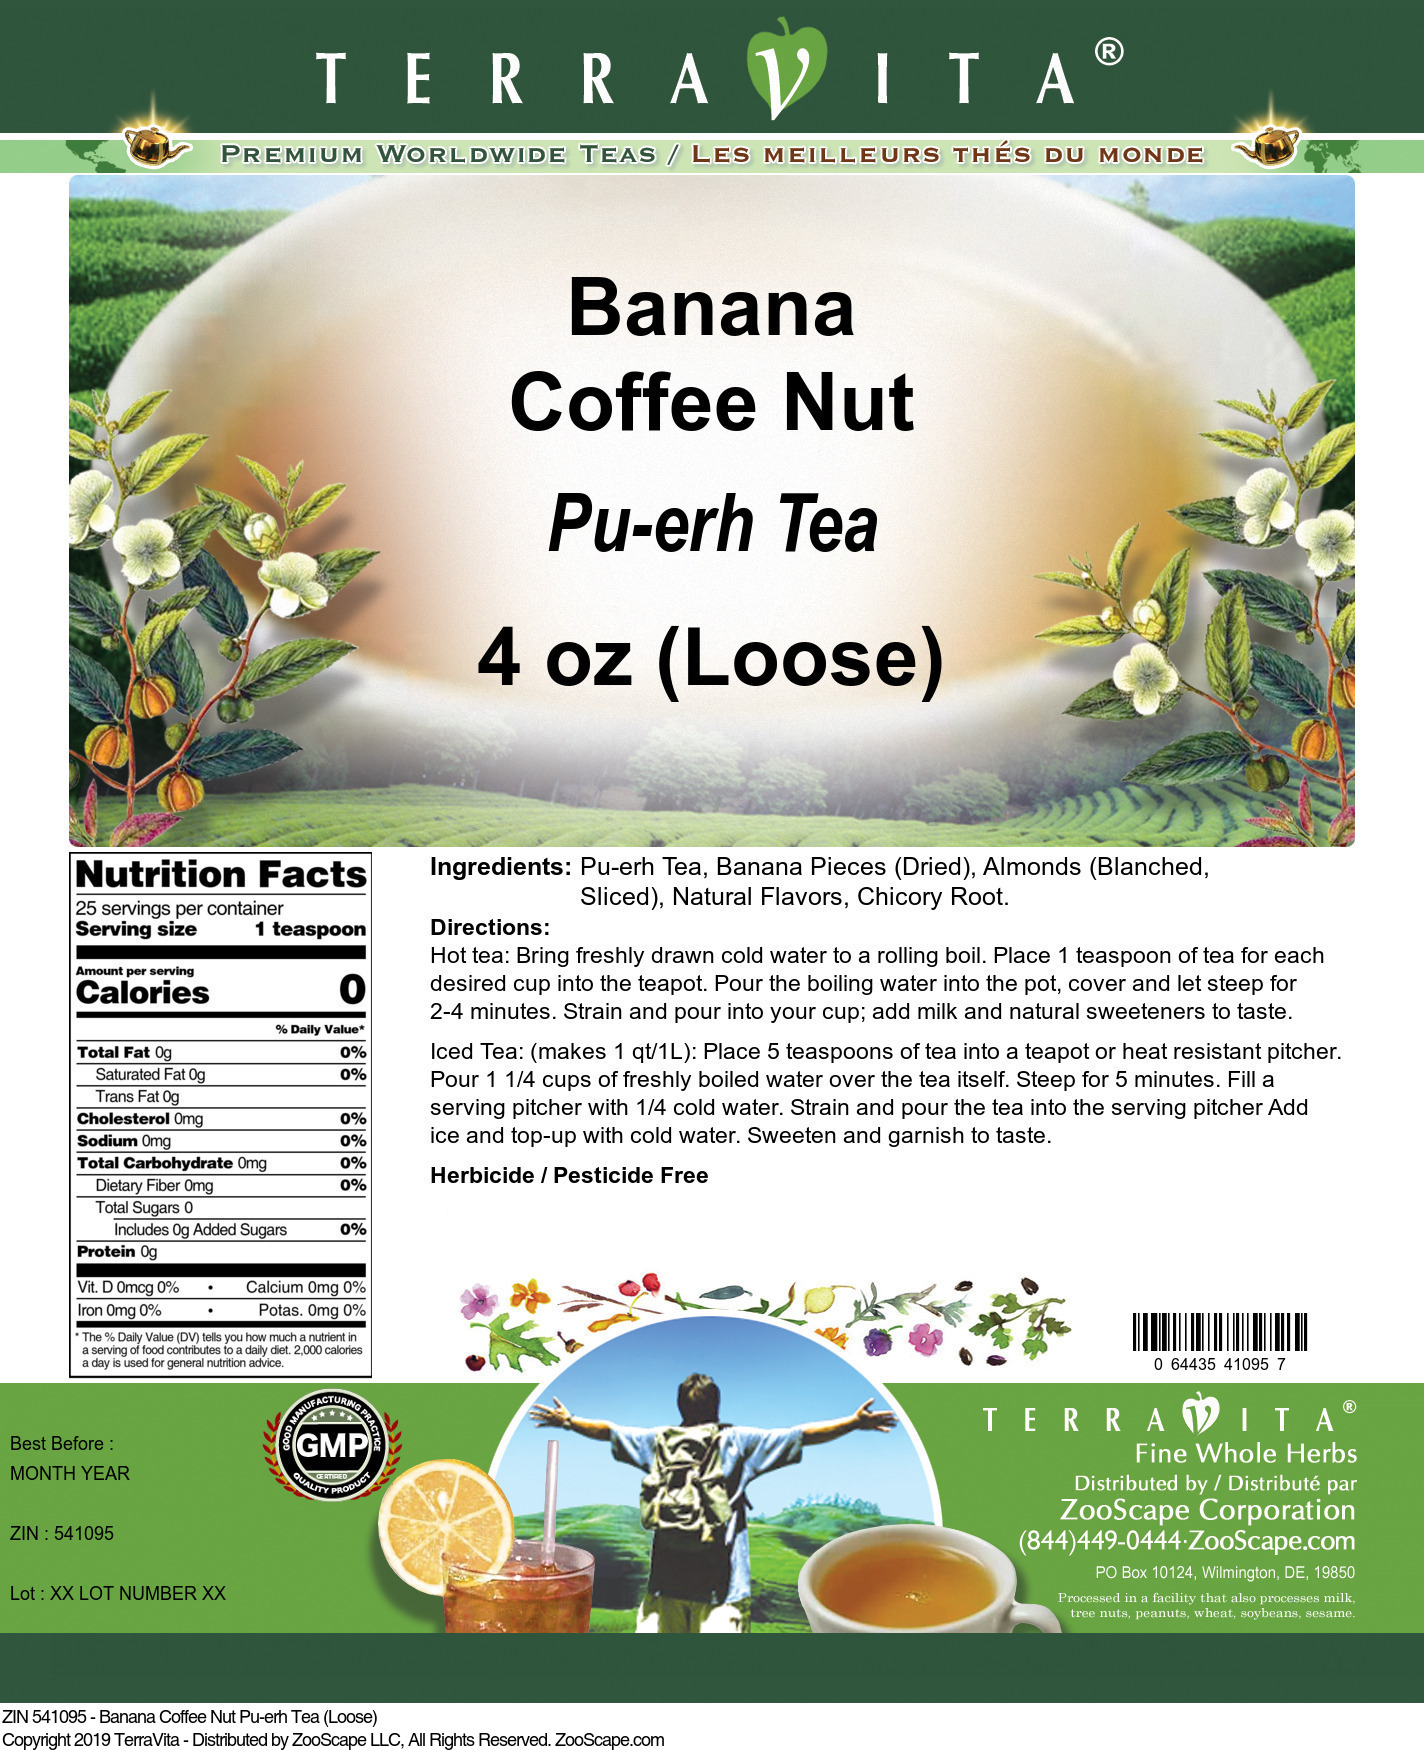 Banana Coffee Nut Pu-erh Tea (Loose)